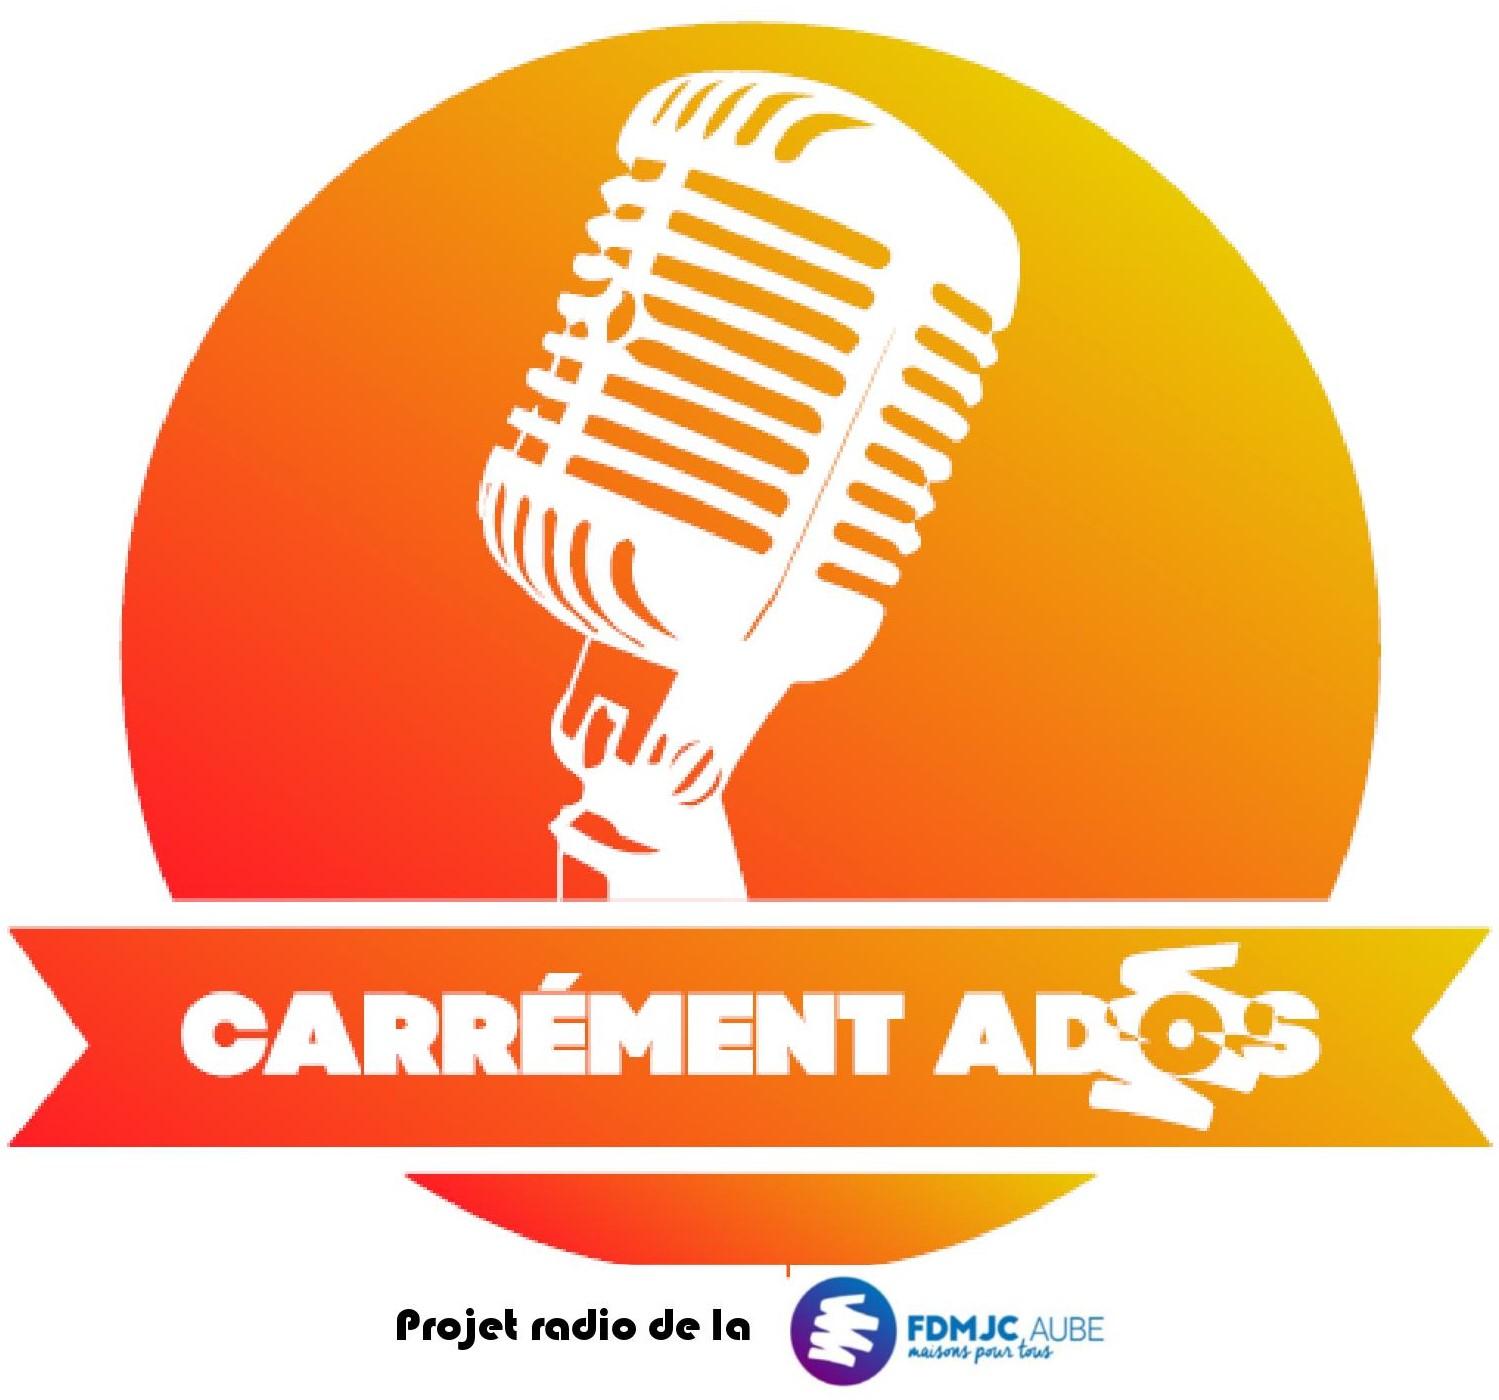 LOGO carrement ados 10072017 1